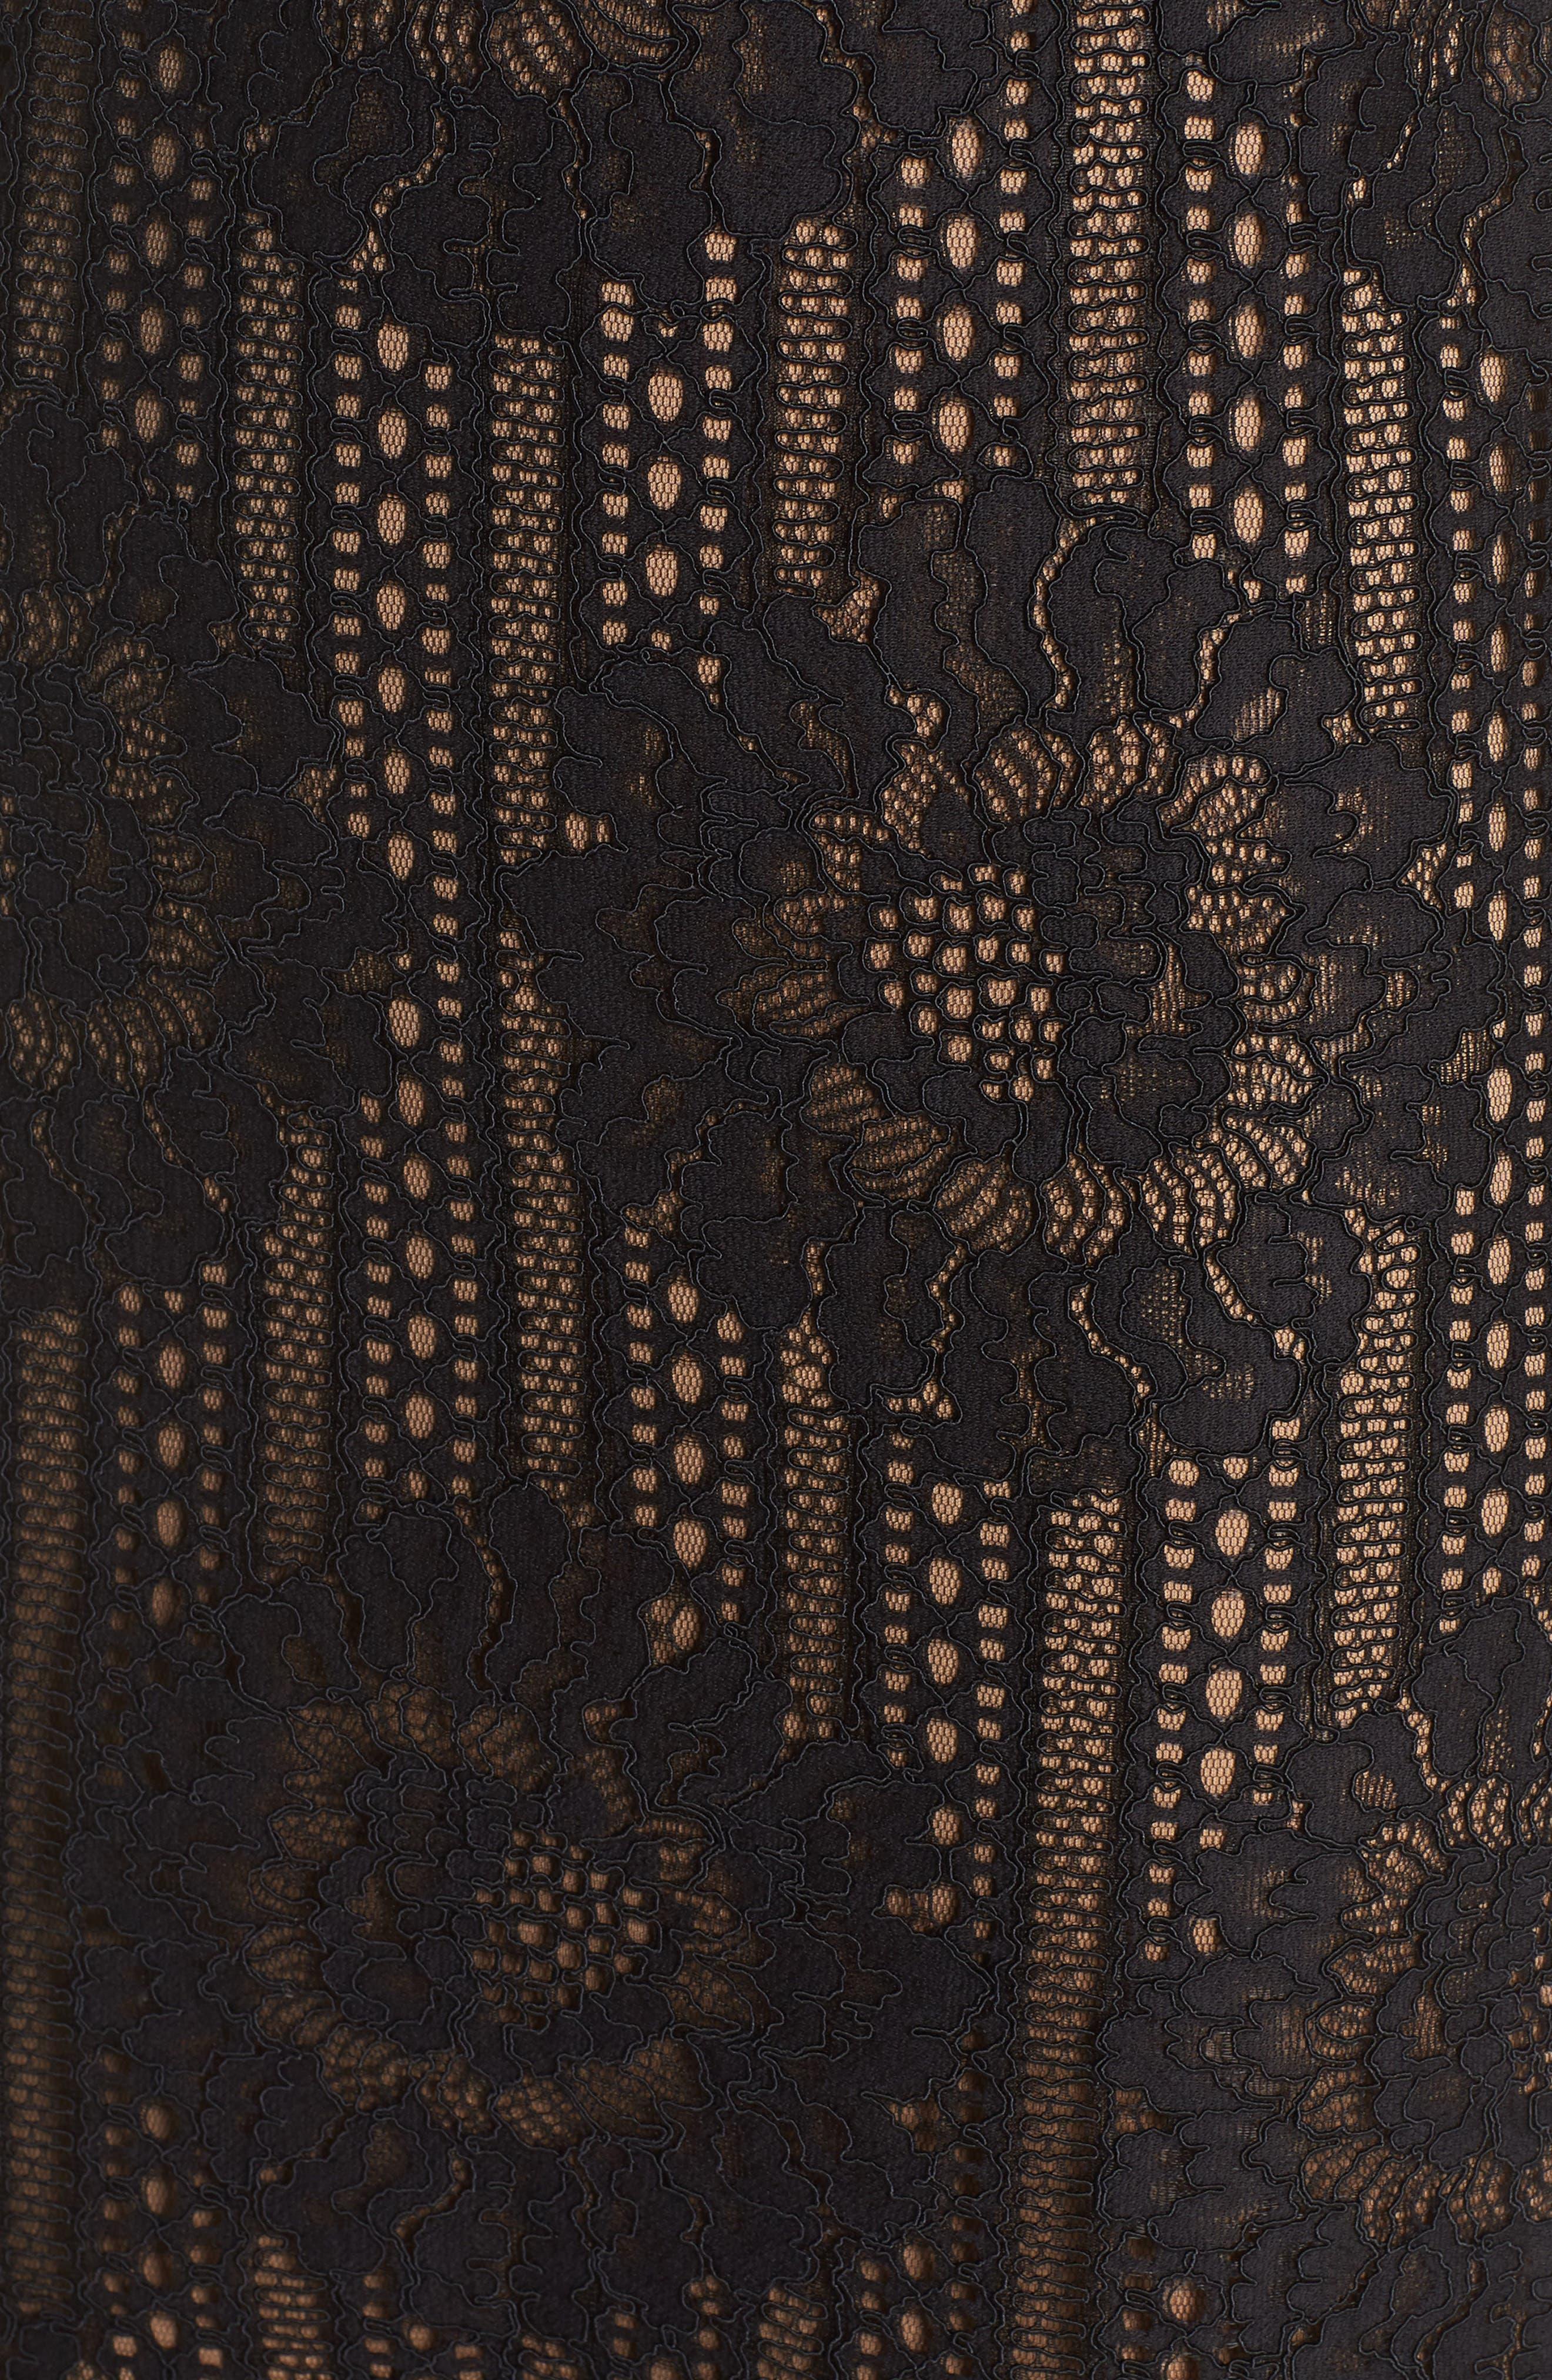 Tie Sleeve Lace Dress,                             Alternate thumbnail 5, color,                             Black/ Nude